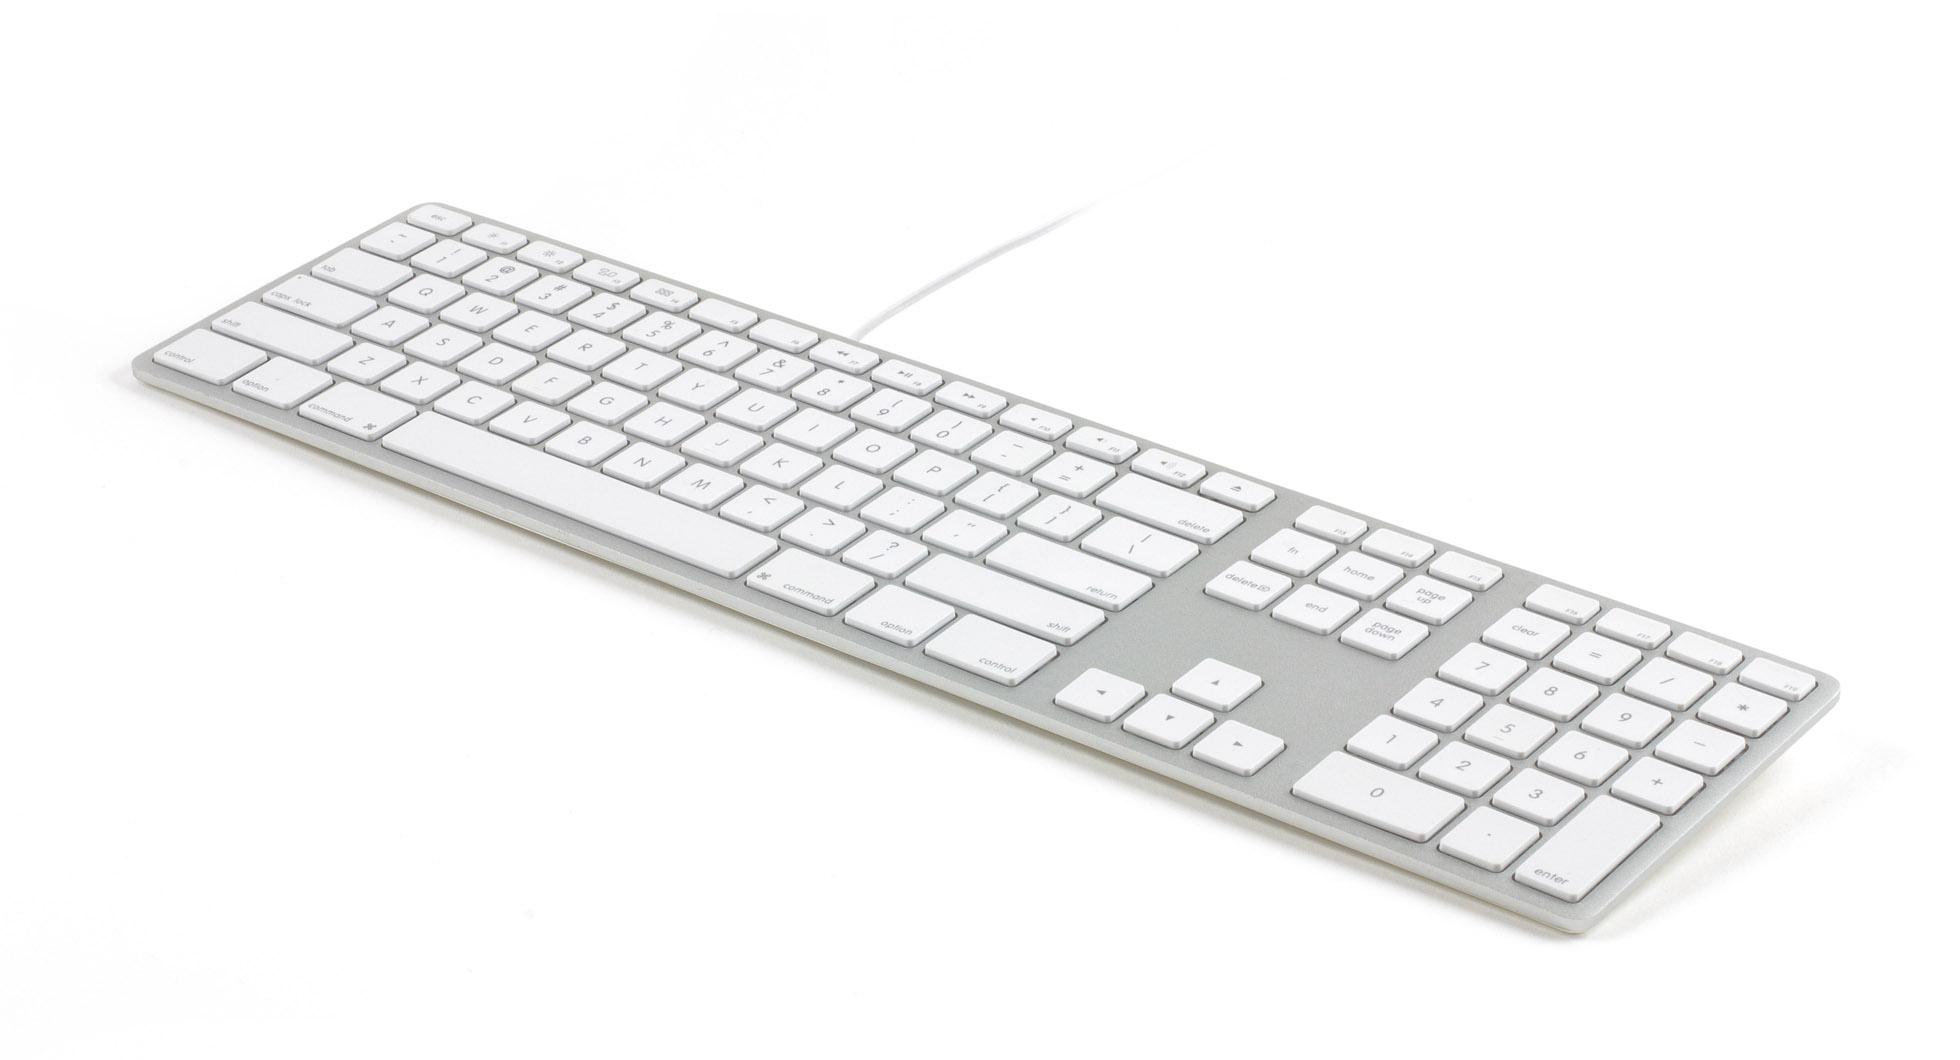 Matias Announces RGB-Backlit Version of Wired Aluminum